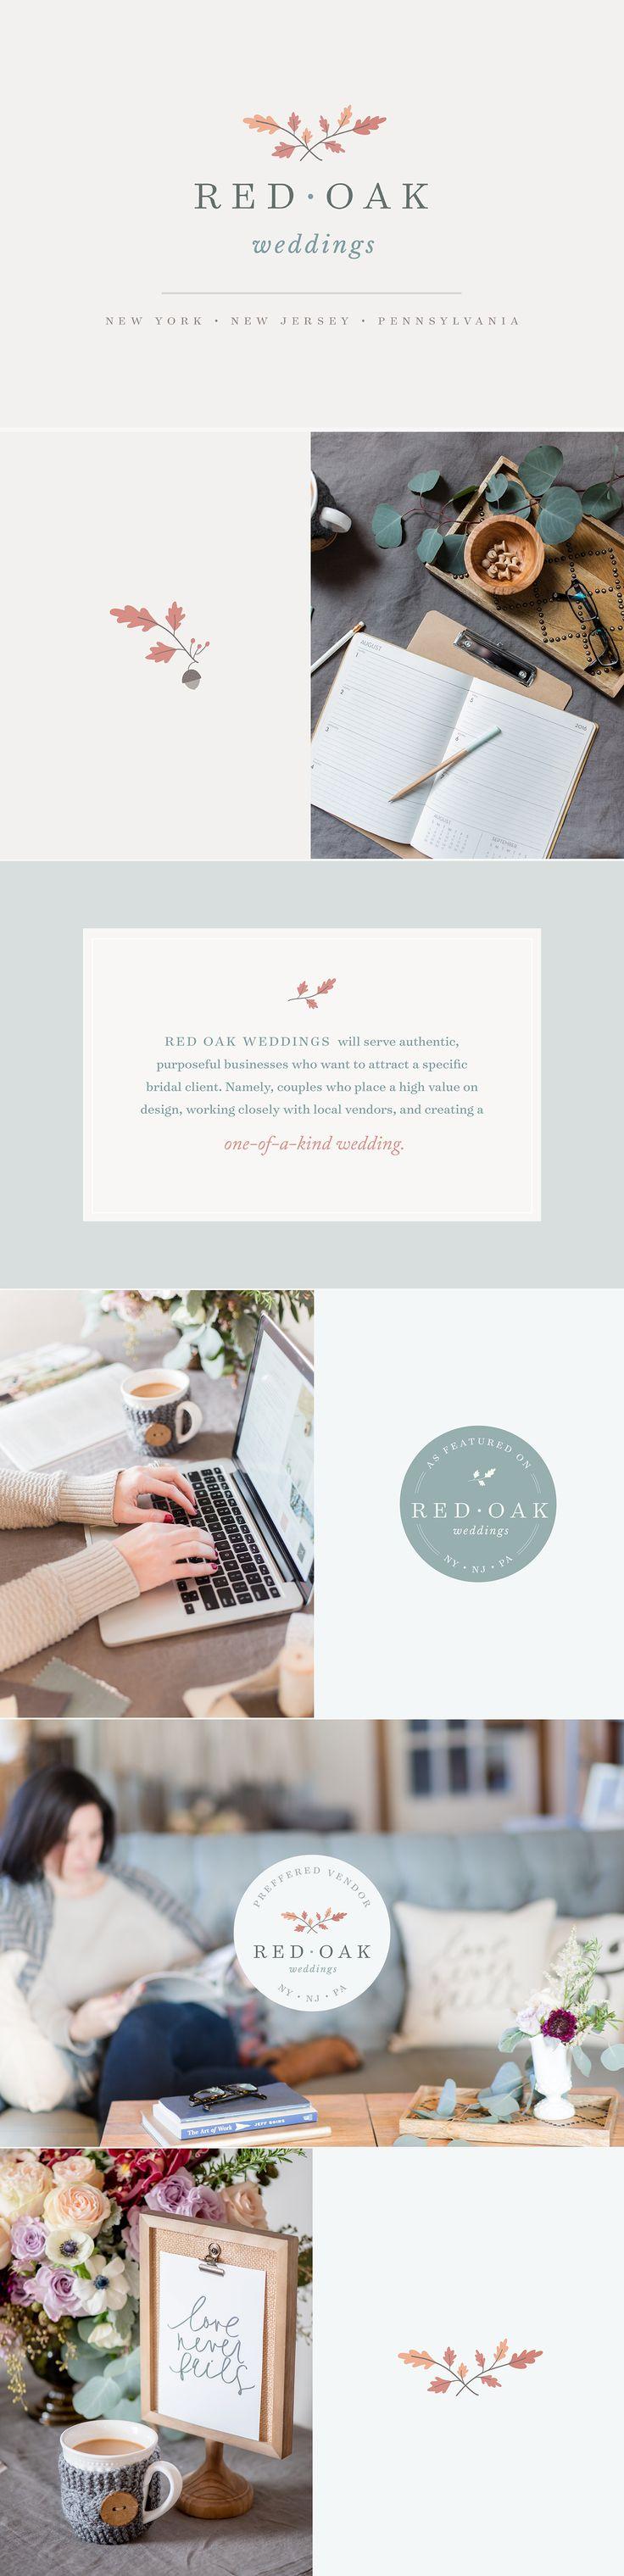 Meg Summerfield Creative Studio | Red Oak Weddings Brand Design | Photo Cred: Laura Lee Photograhy and Cinnamon Wolfe Photography